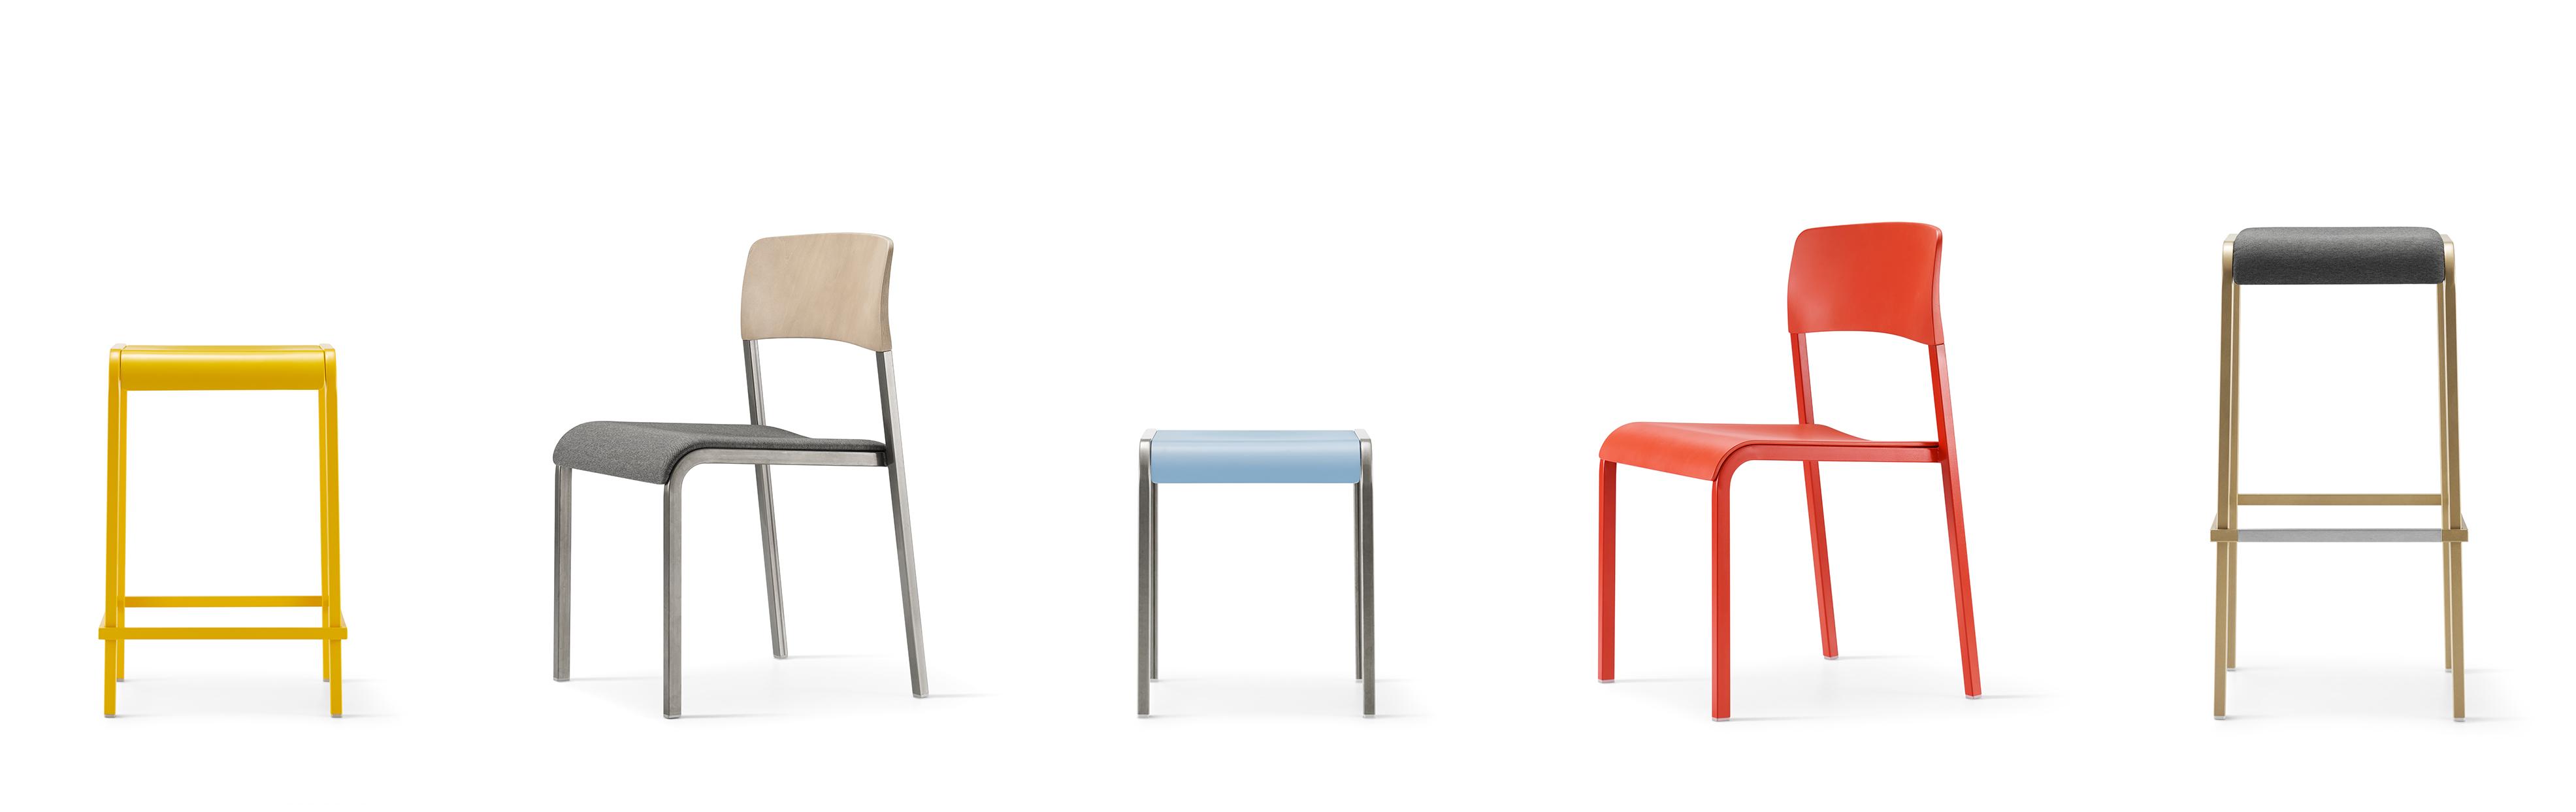 Viiva Chairs Stools